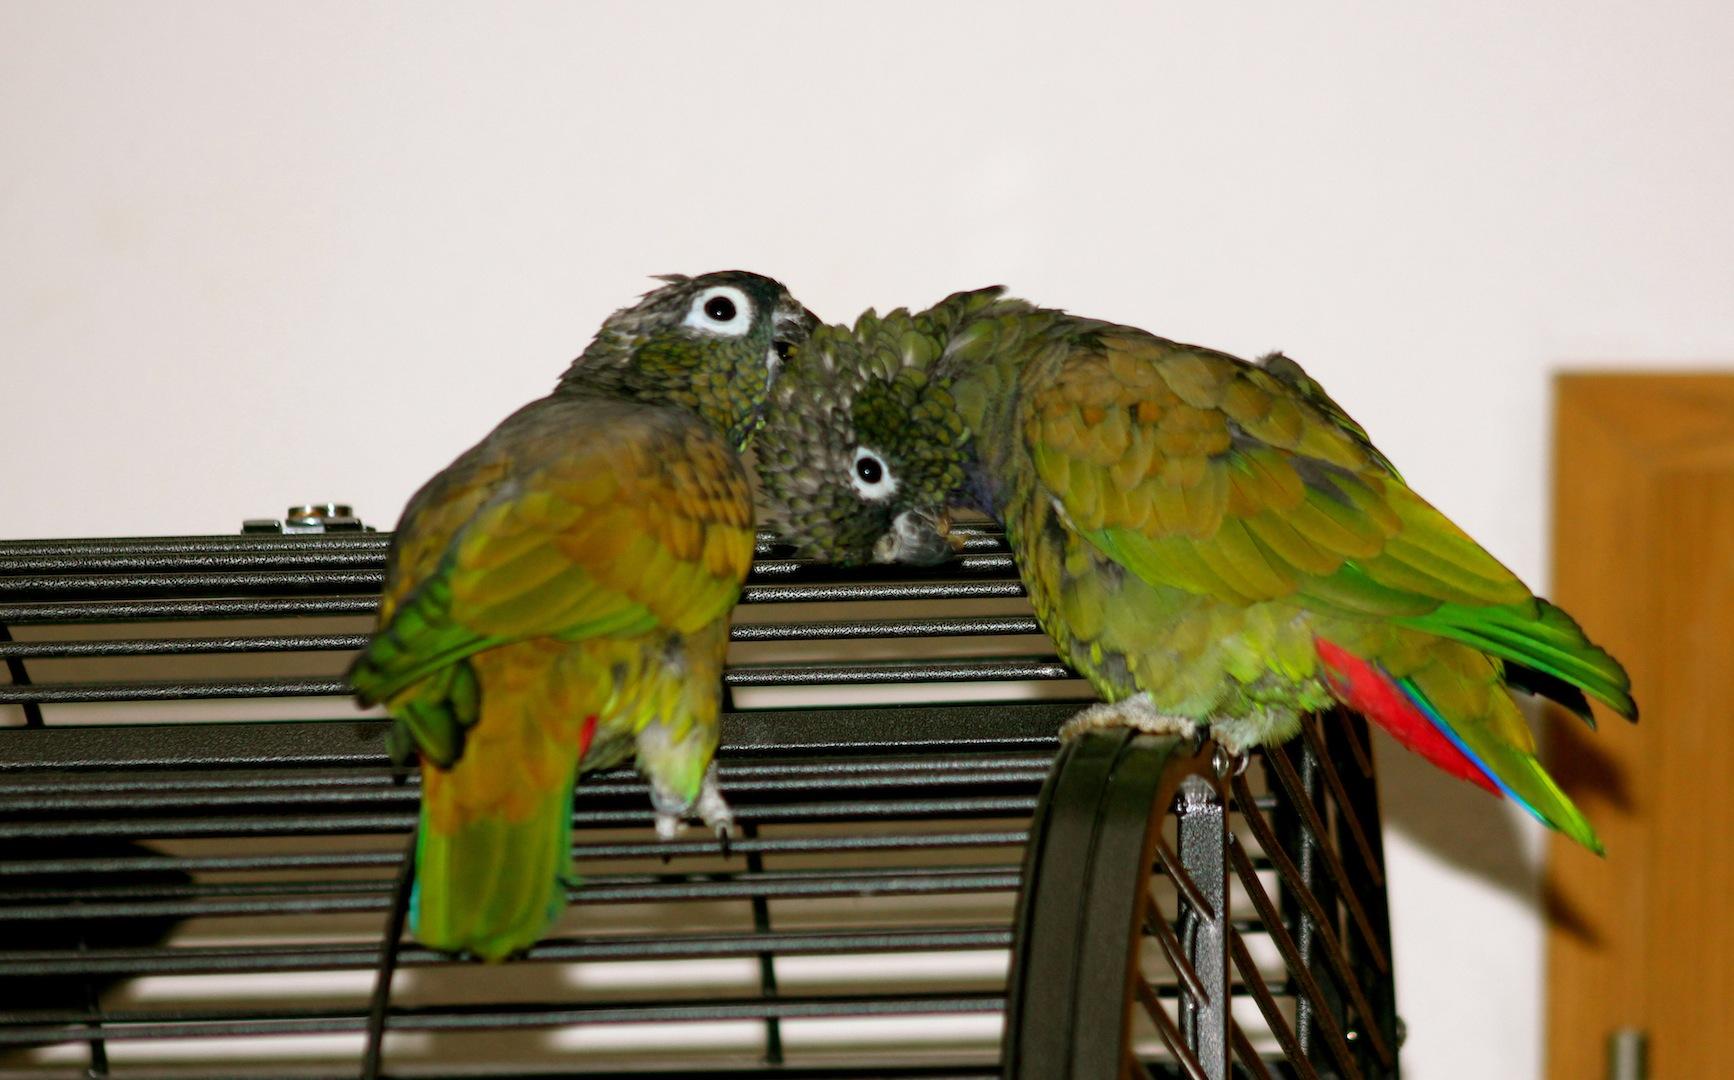 Chica & Gonzo